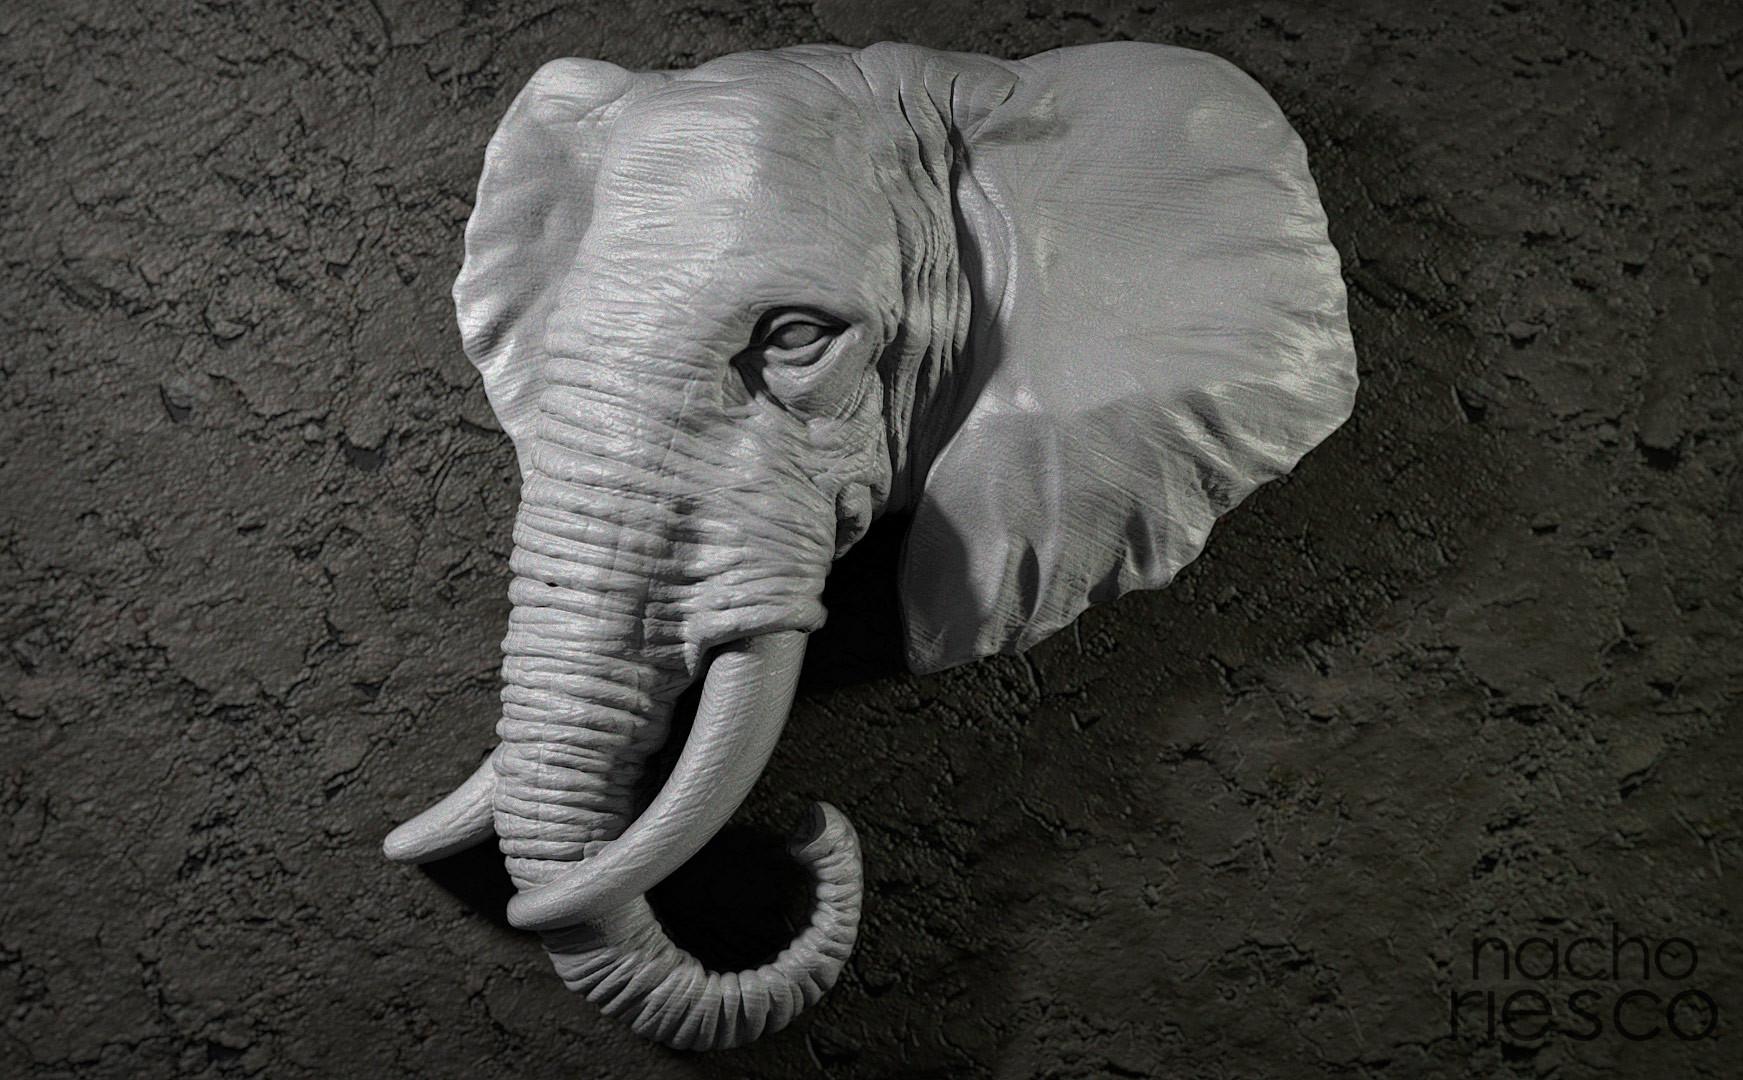 Nacho riesco gostanza elefante 500k